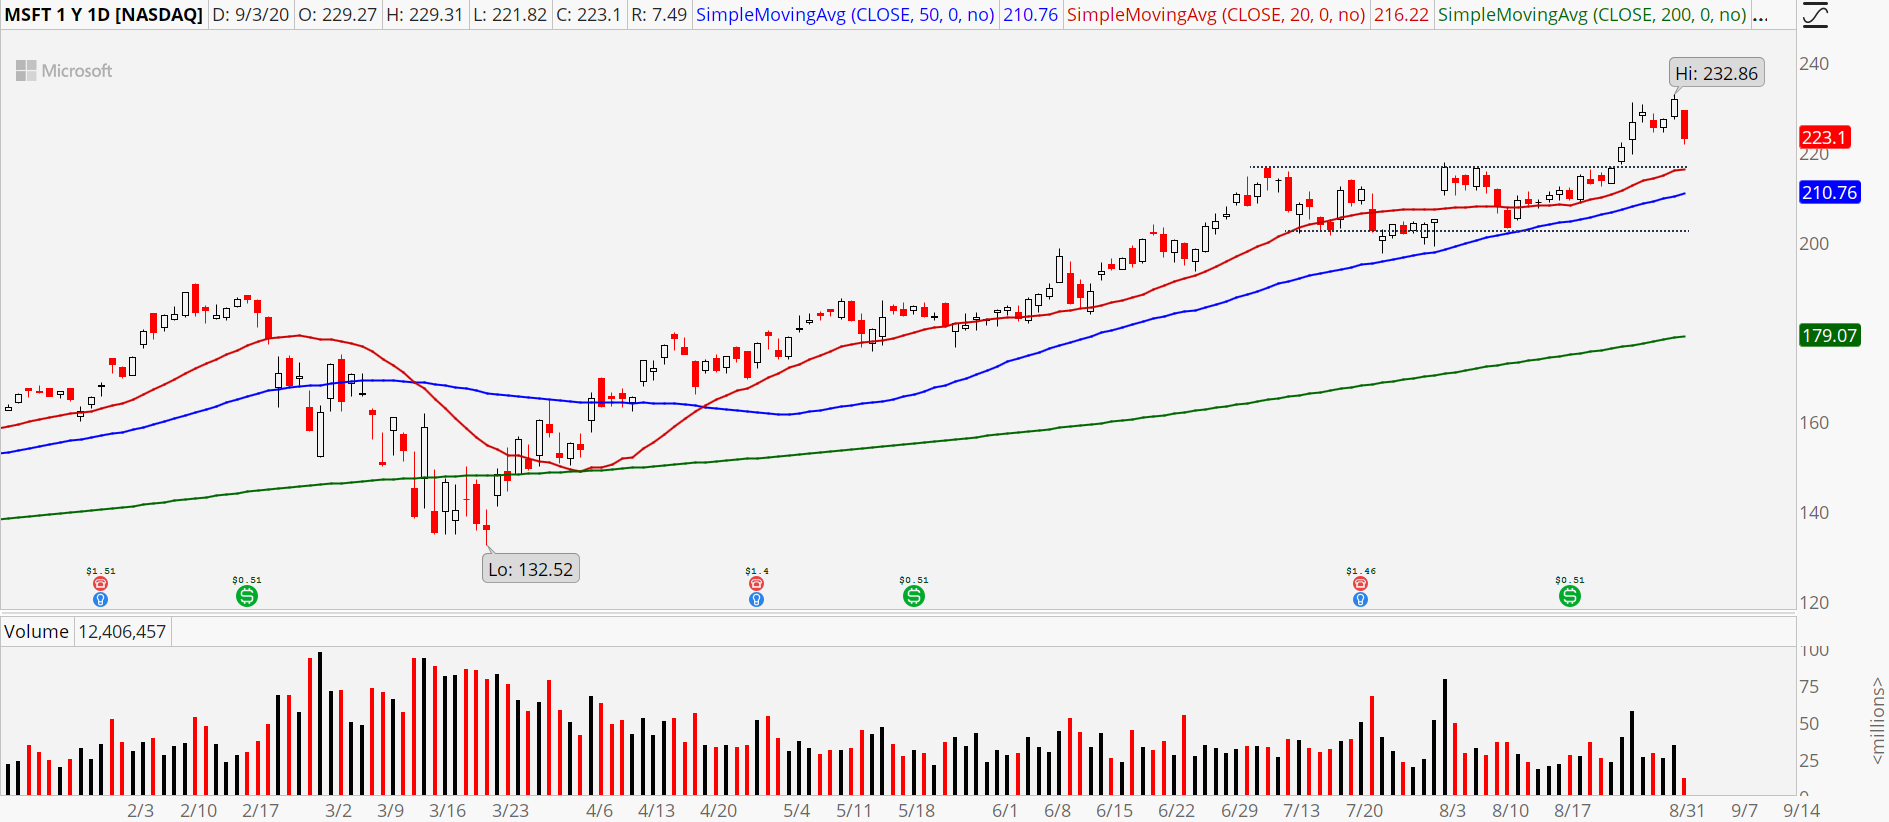 Microsoft (MSFT) stock chart showing downside reversal